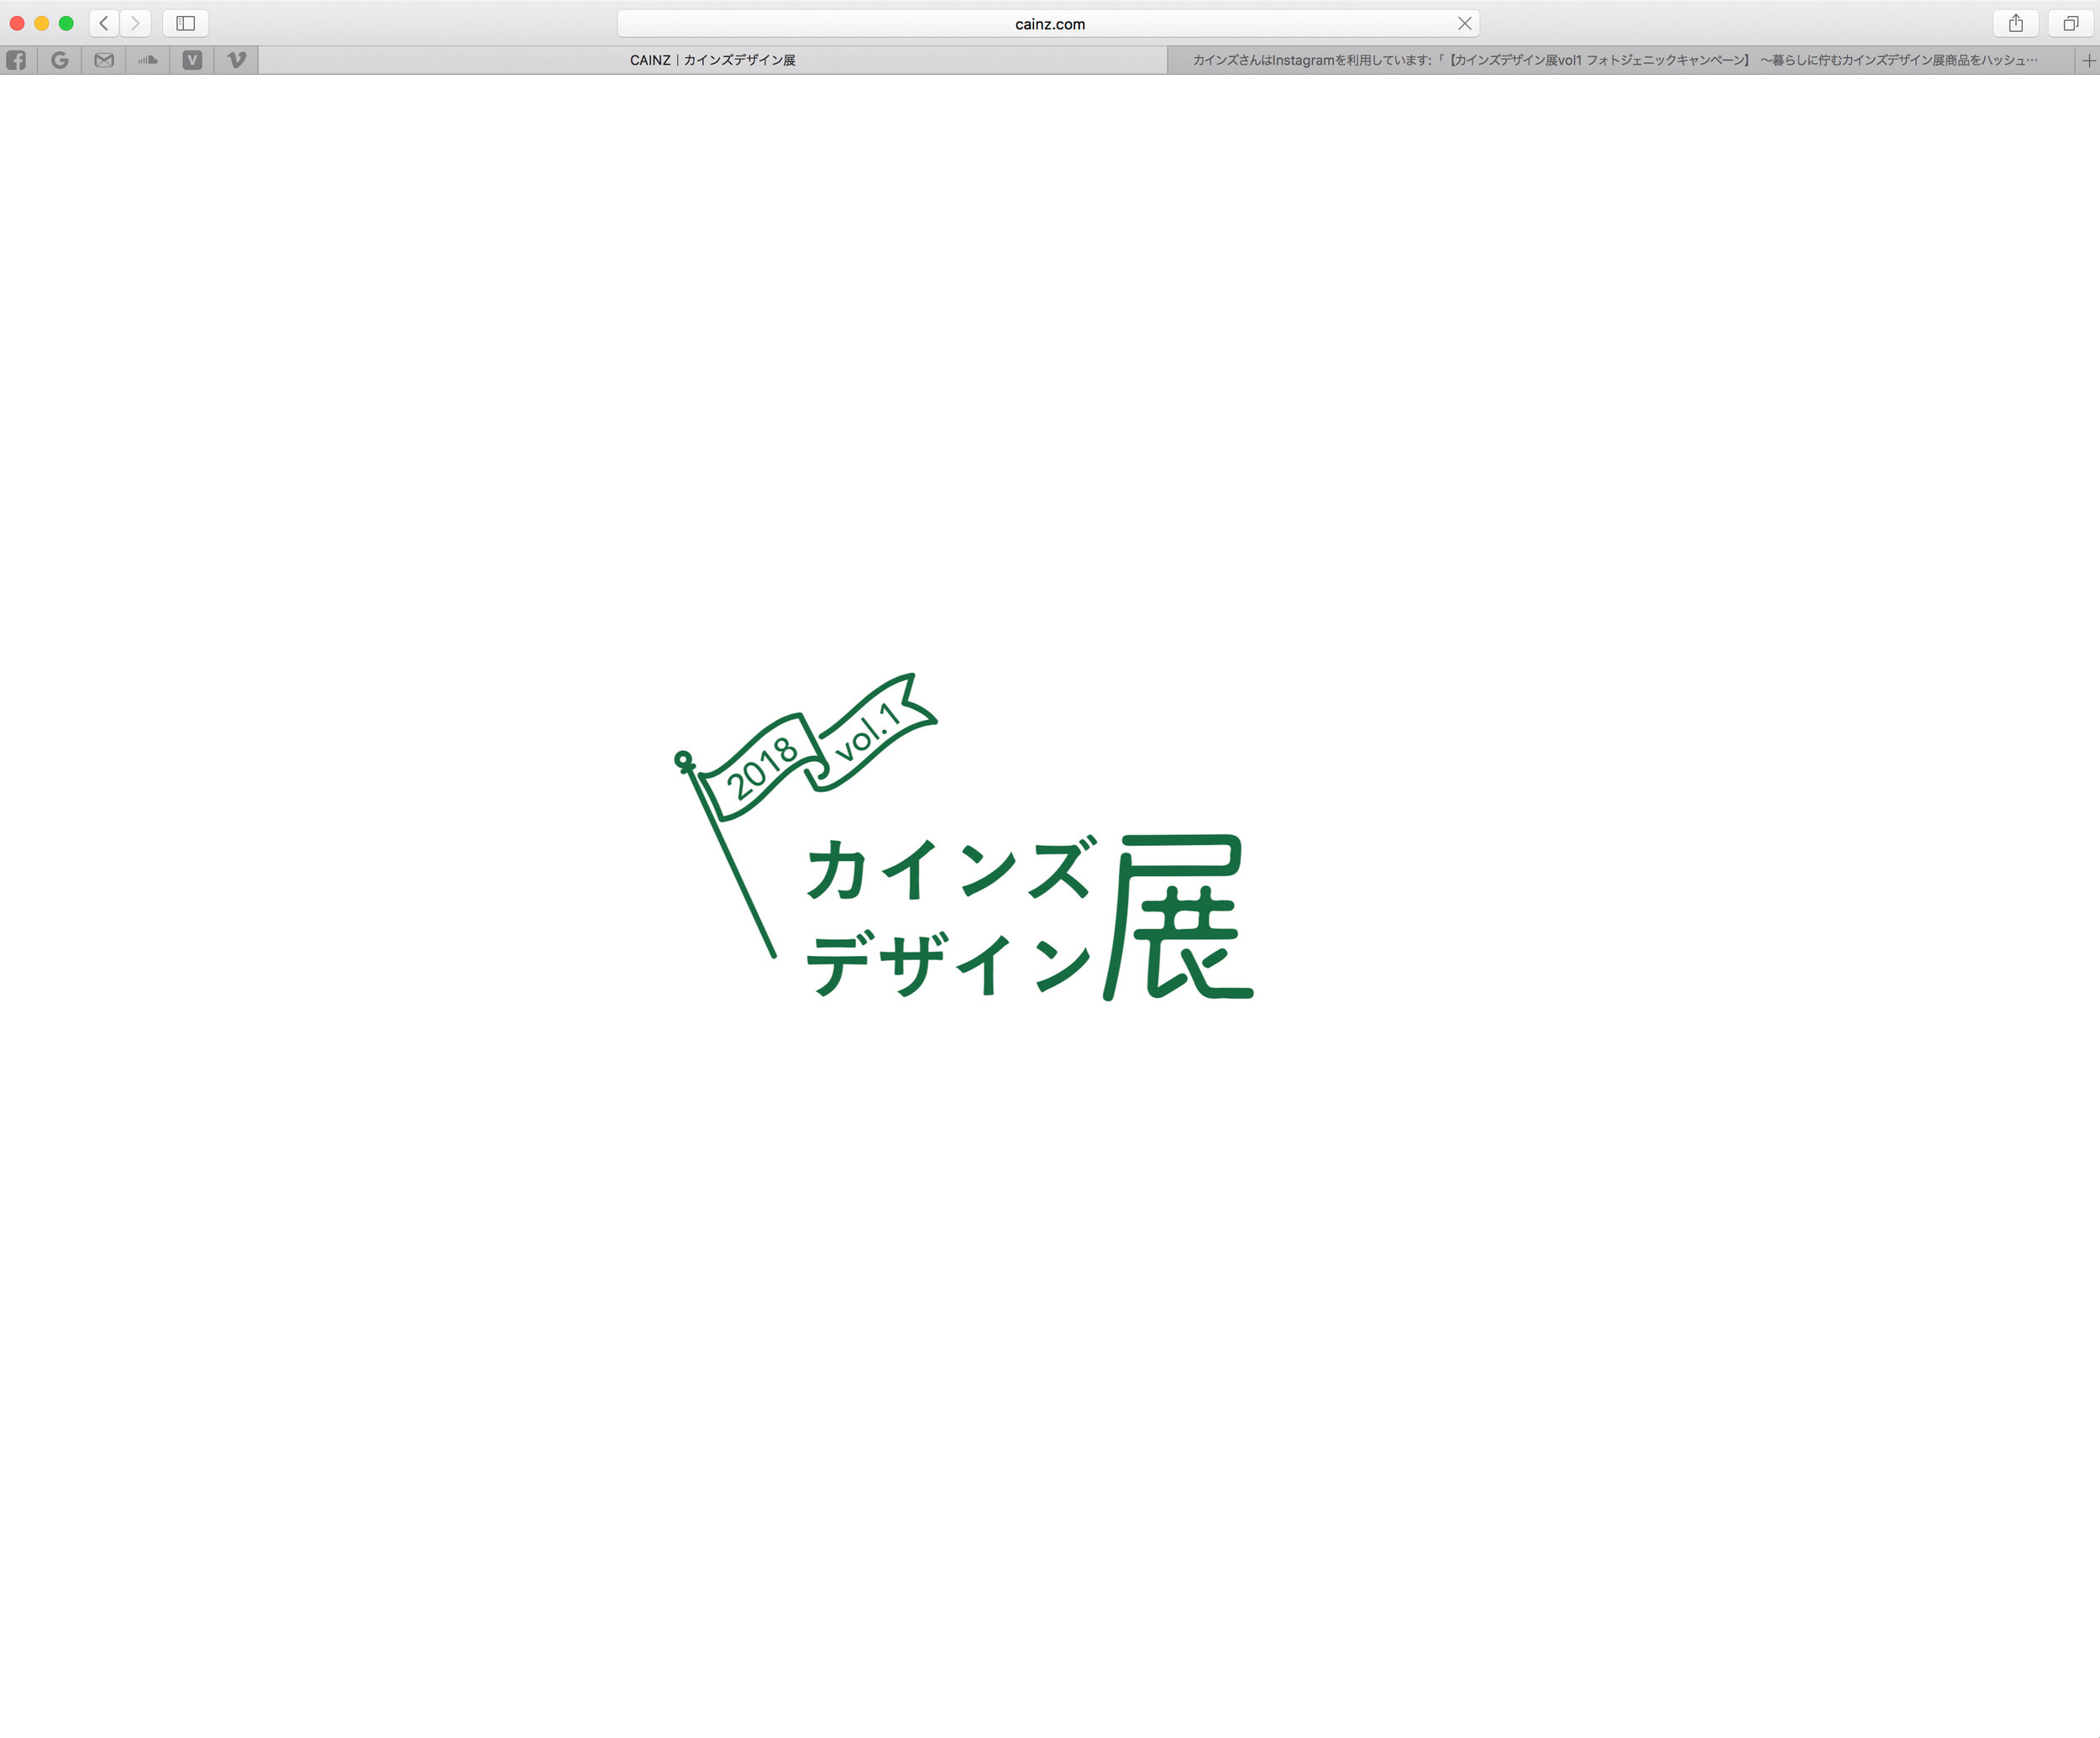 CAINZ_web_cap_13.jpg